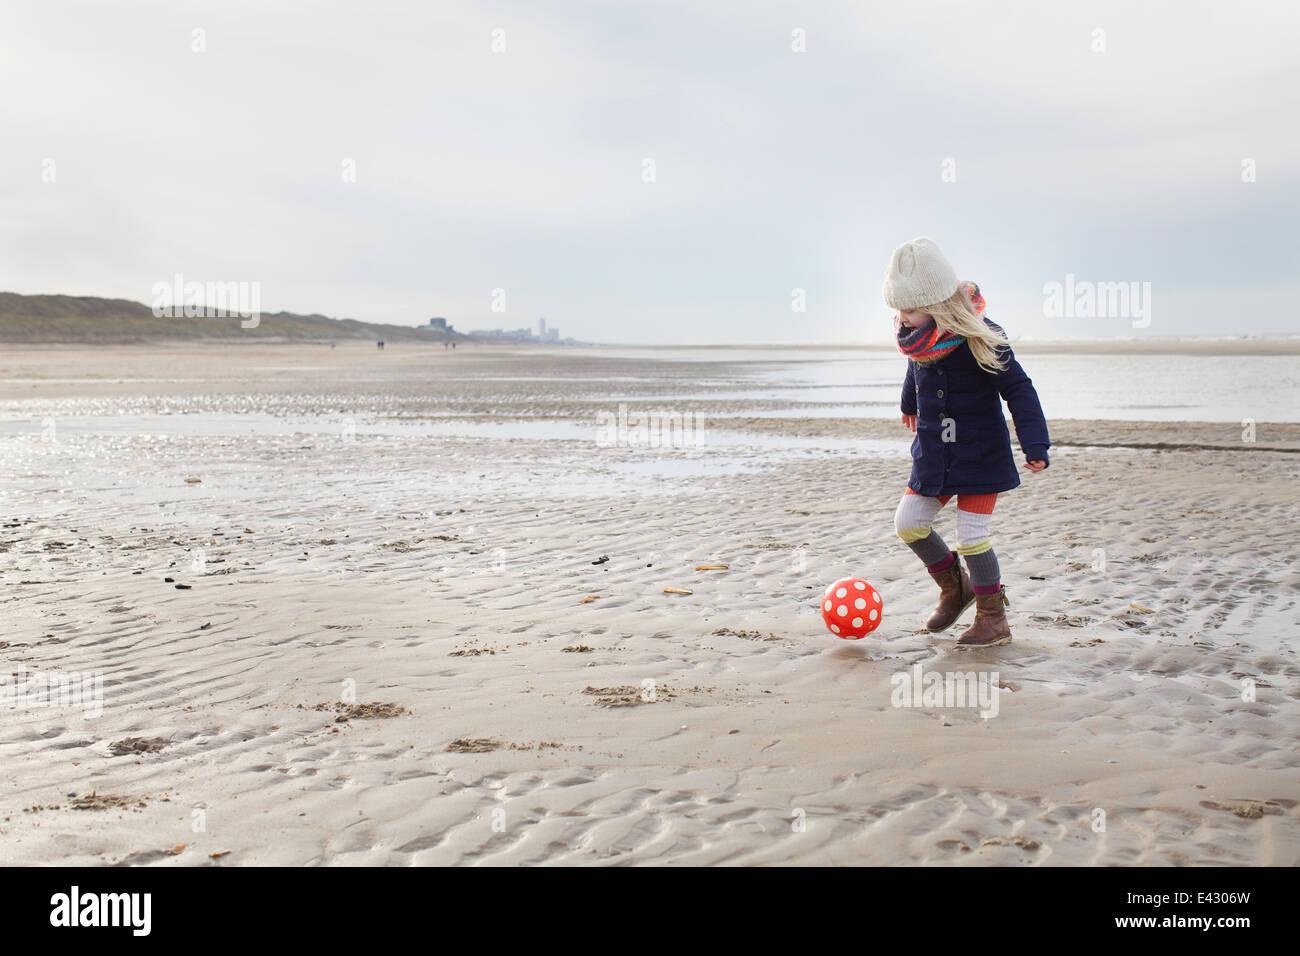 Three year old girl playing football on beach, Bloemendaal aan Zee, Netherlands Stock Photo